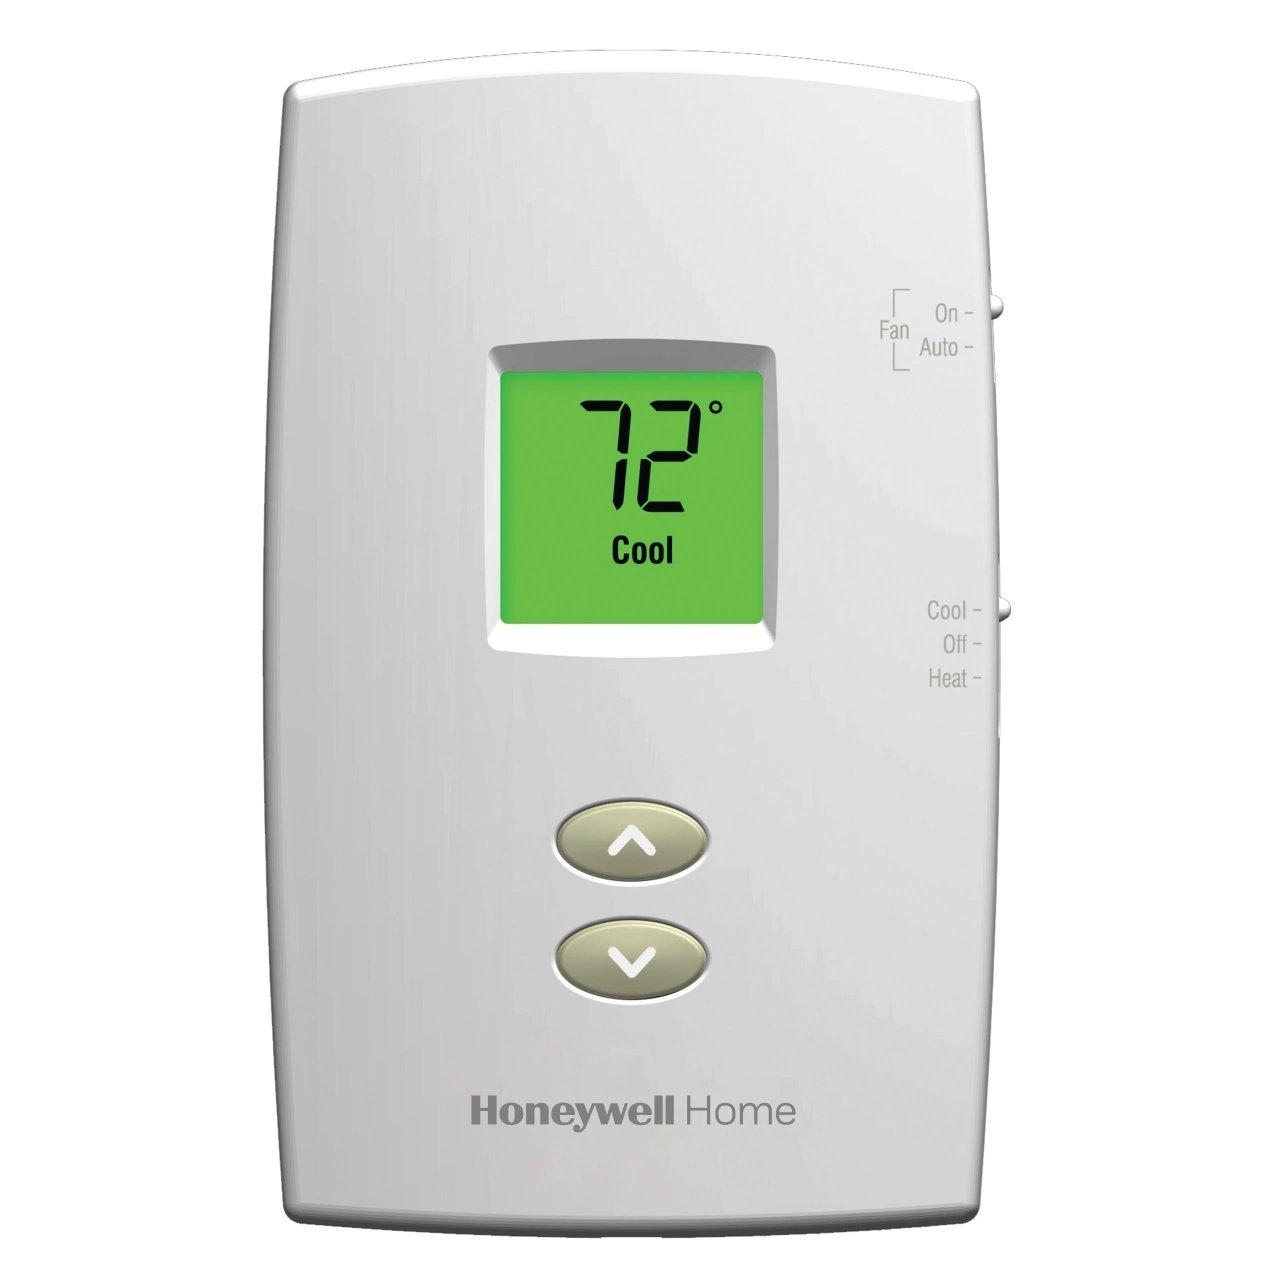 TH1110DV1009/U Thermostat - Honeywell Home | Resideo Pro